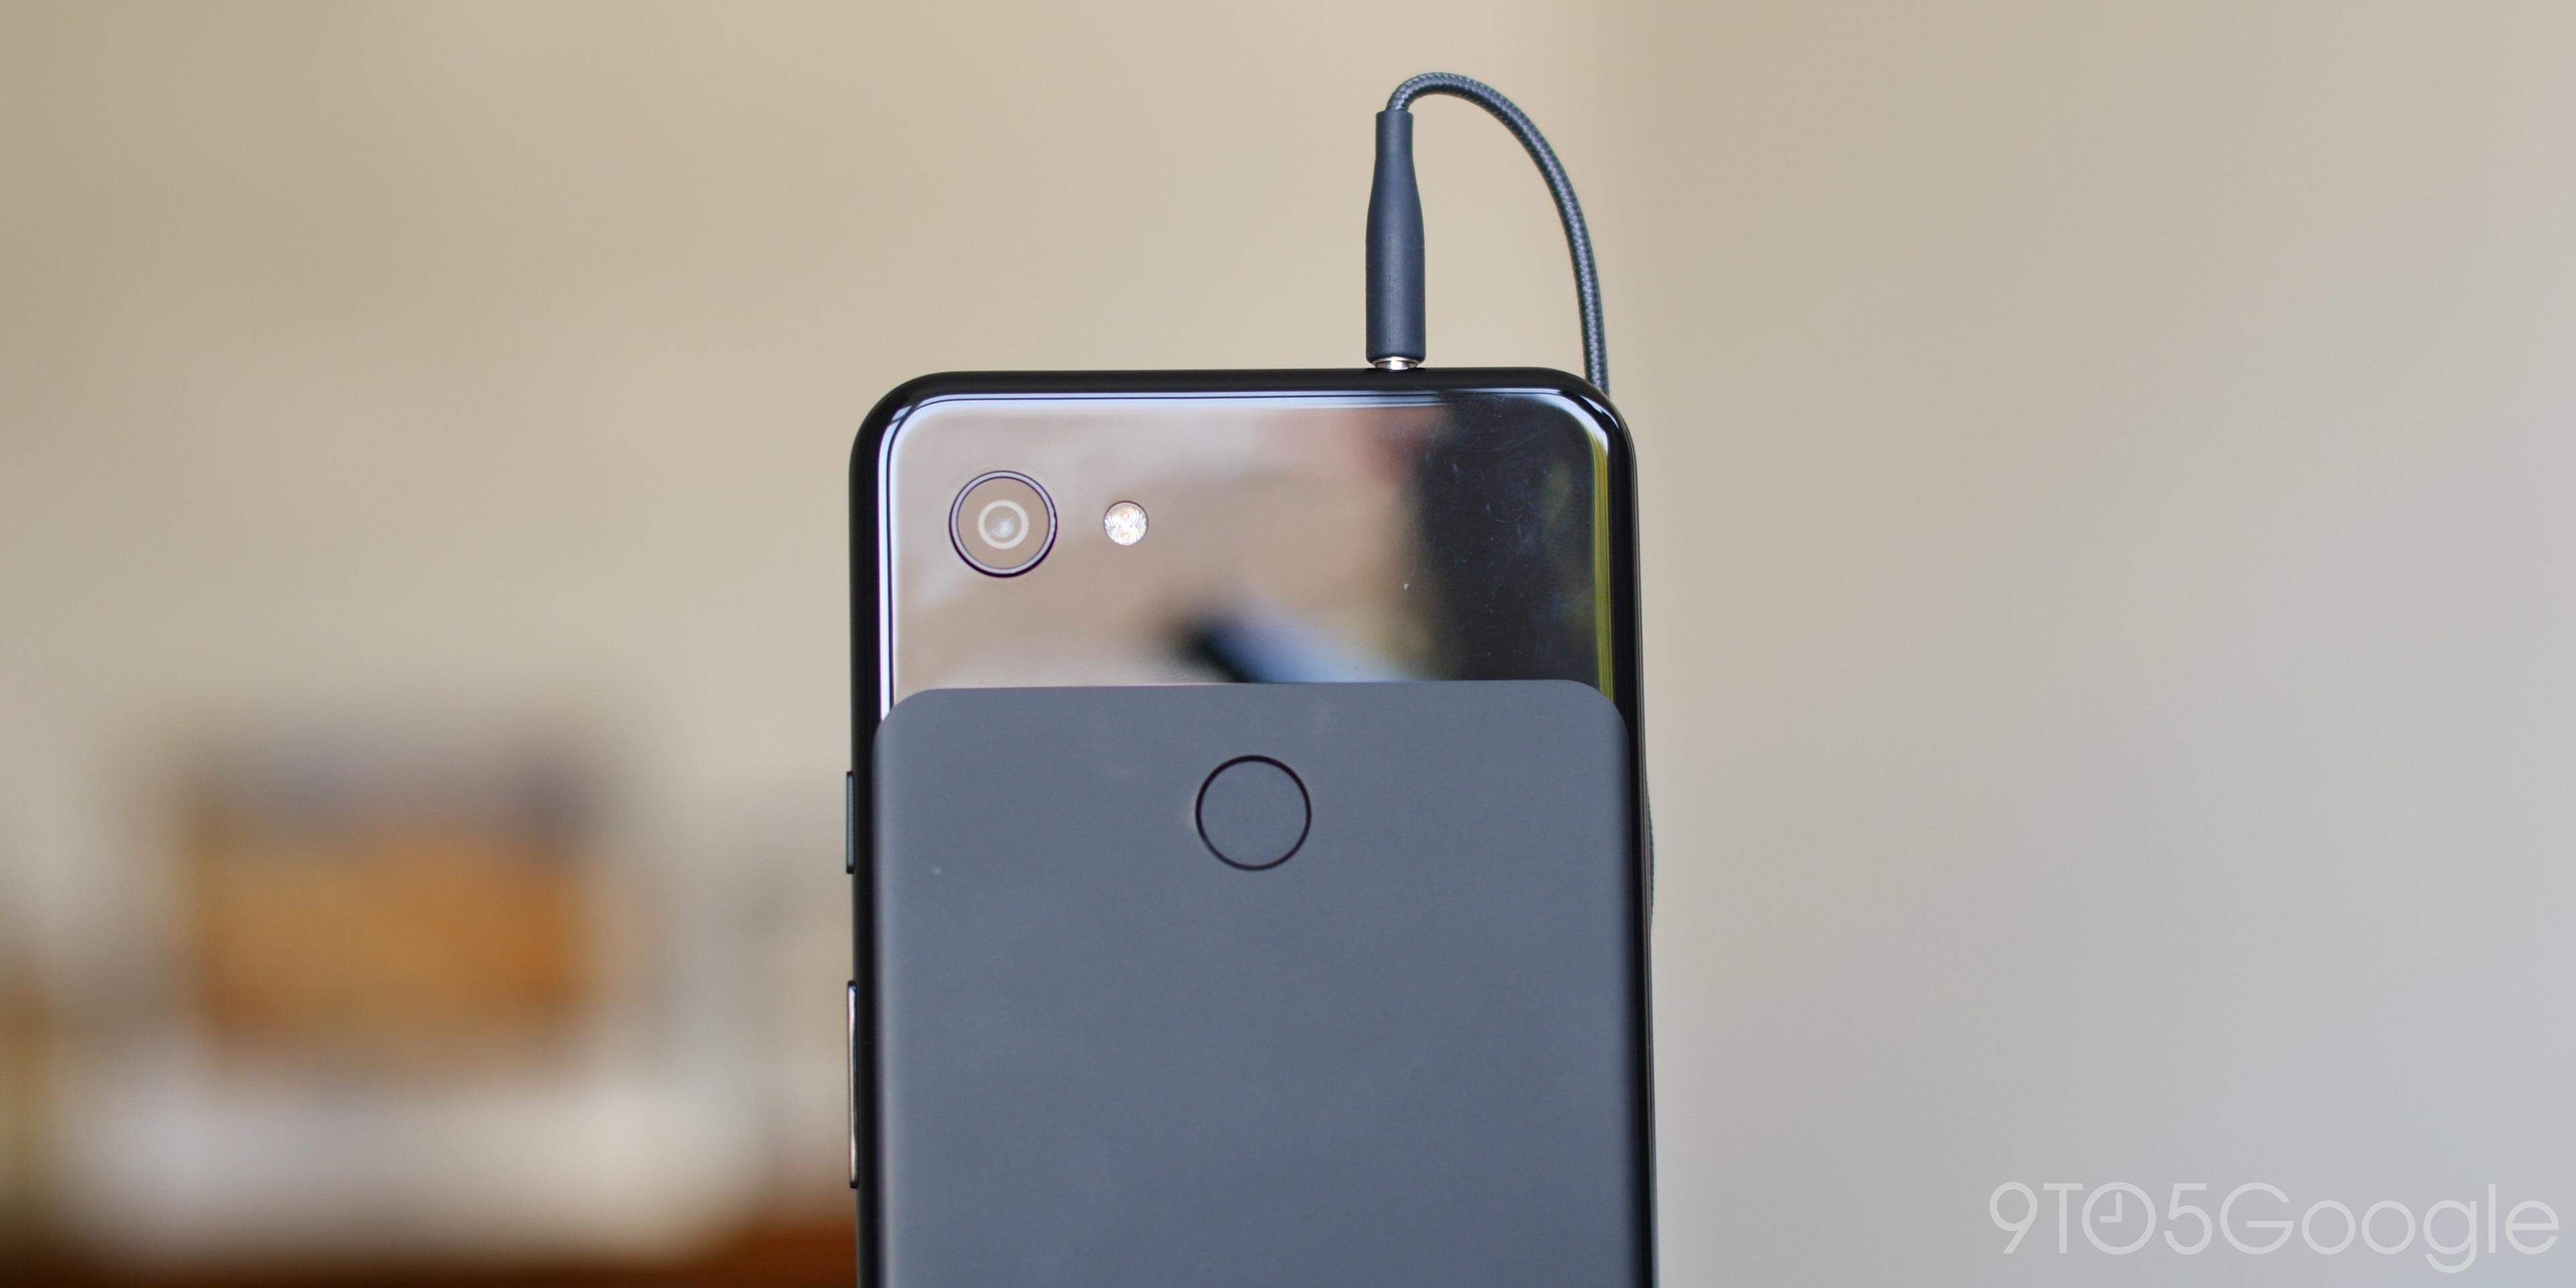 Pixel 3a headphone port